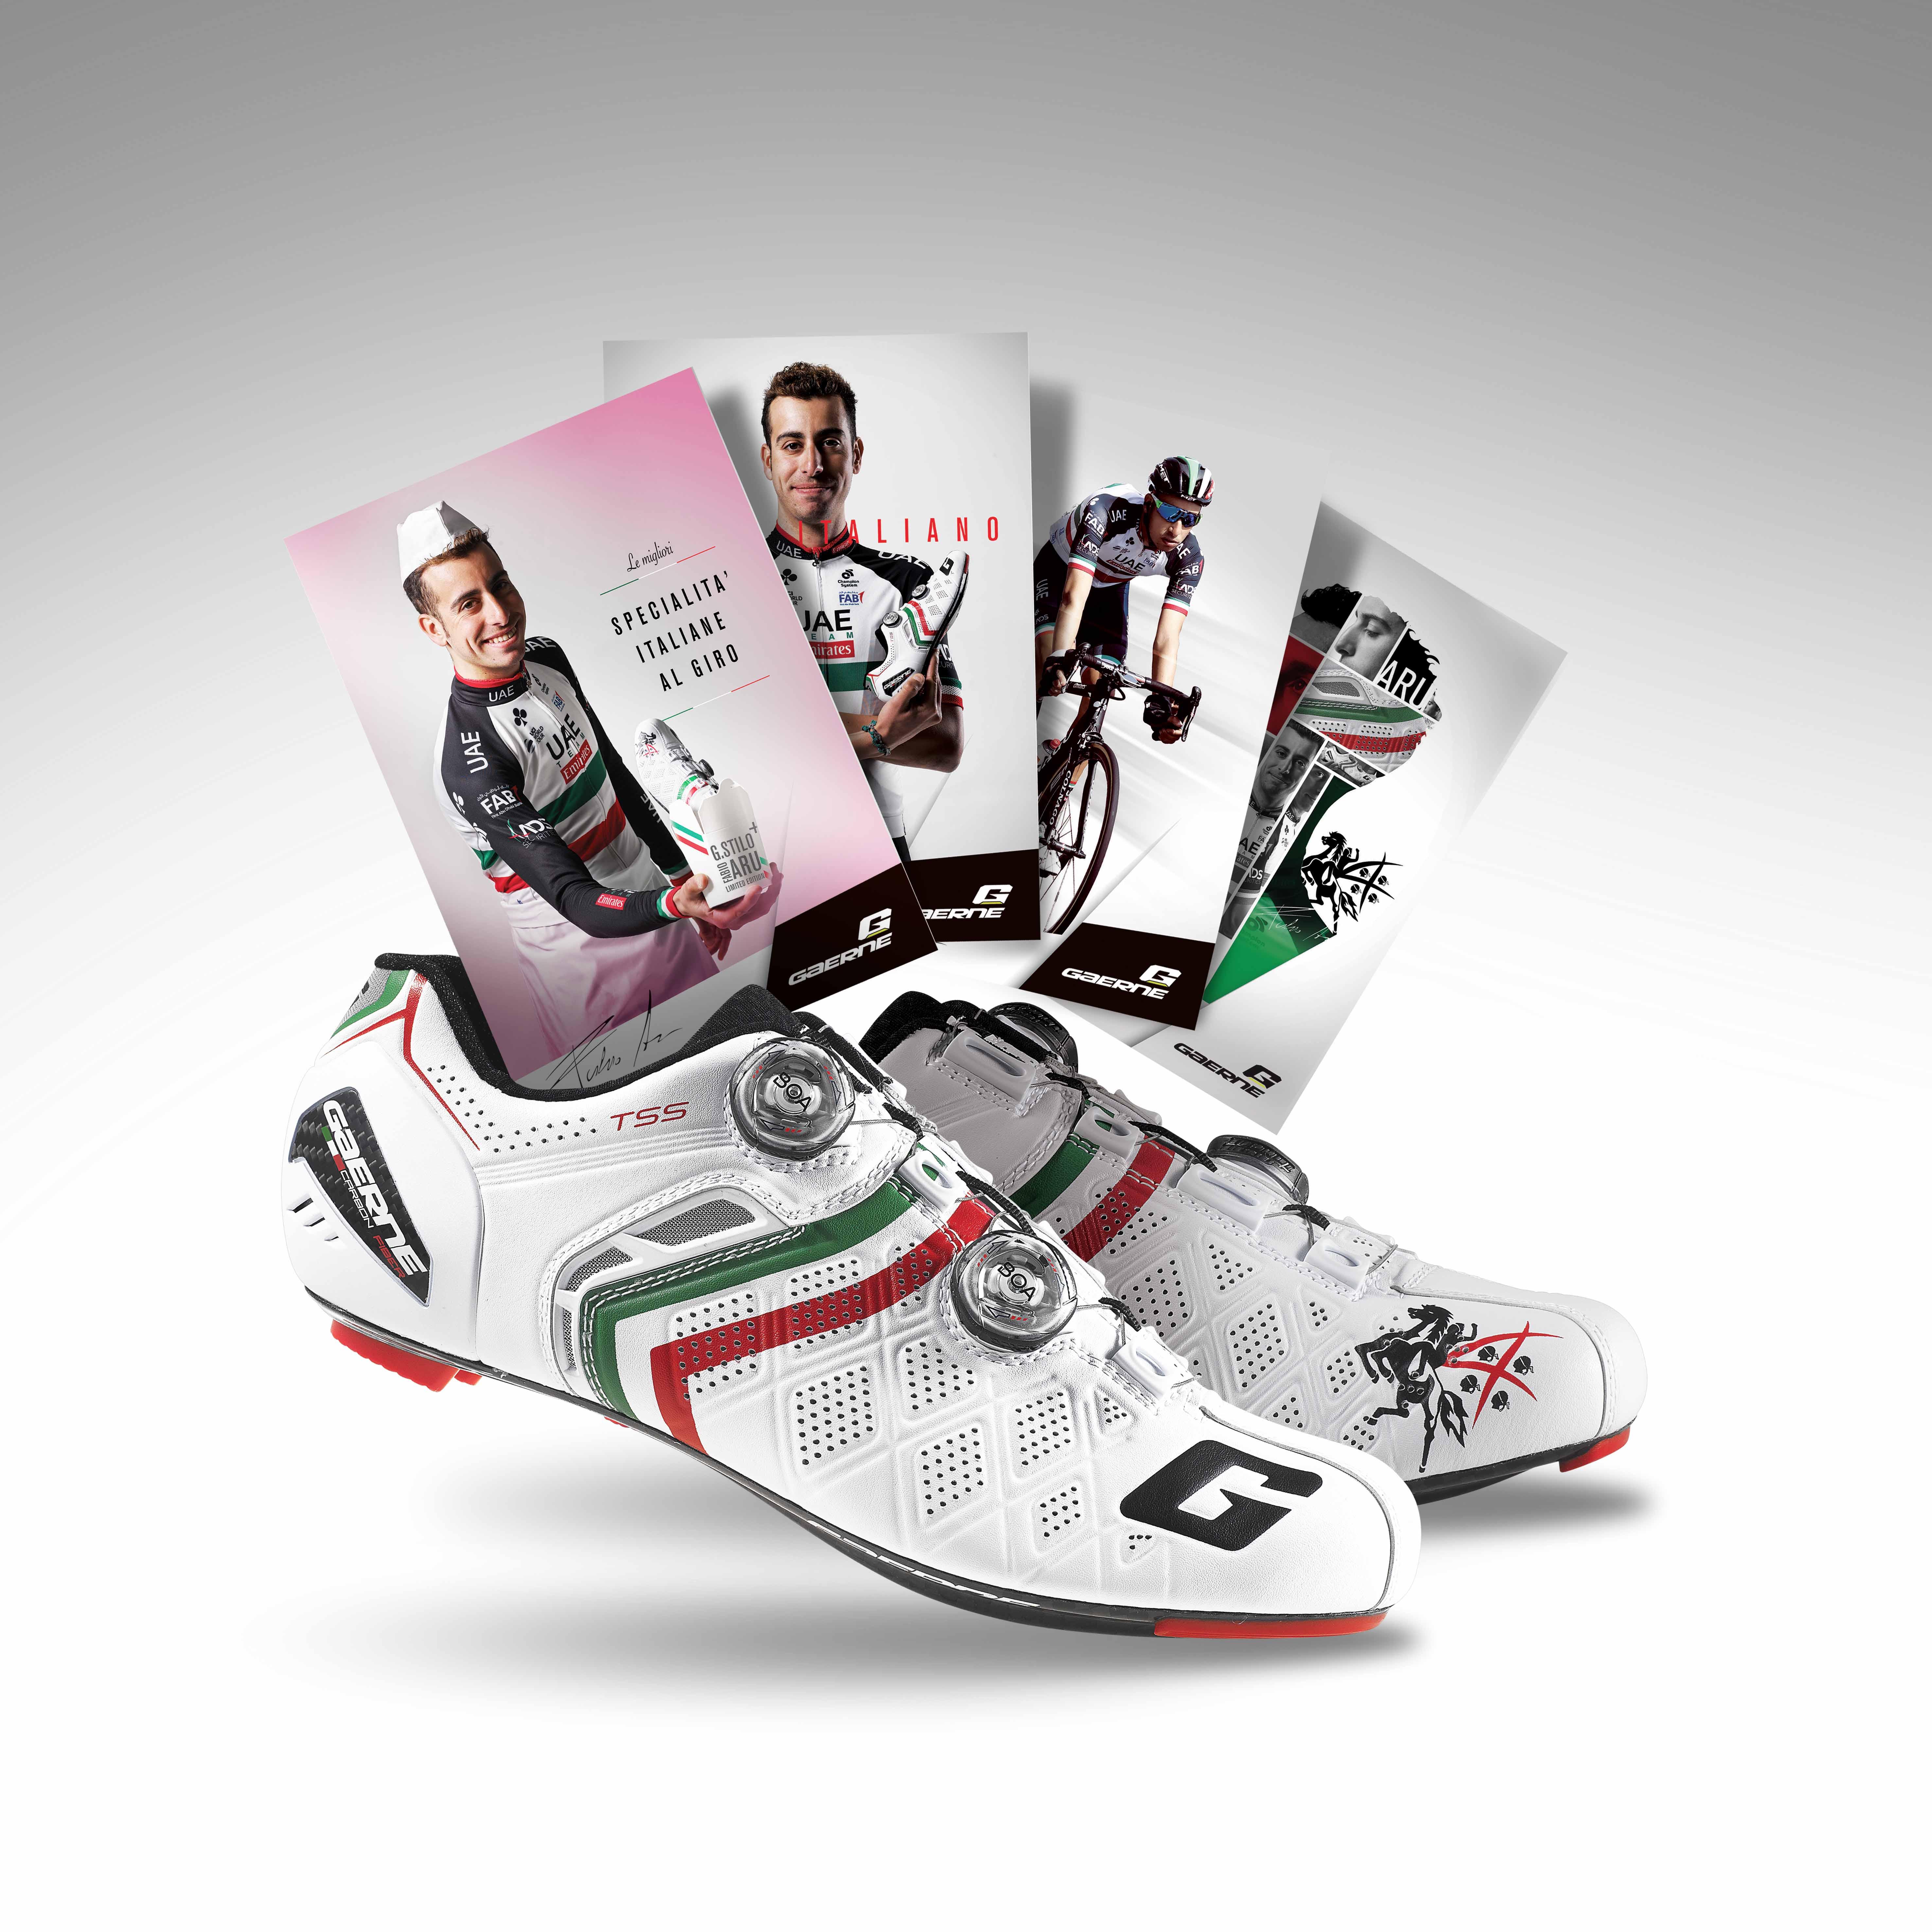 check out 11d83 073bb Gaerne G.Stilo Special Edition Fabio Aru Giro d'Italia ...